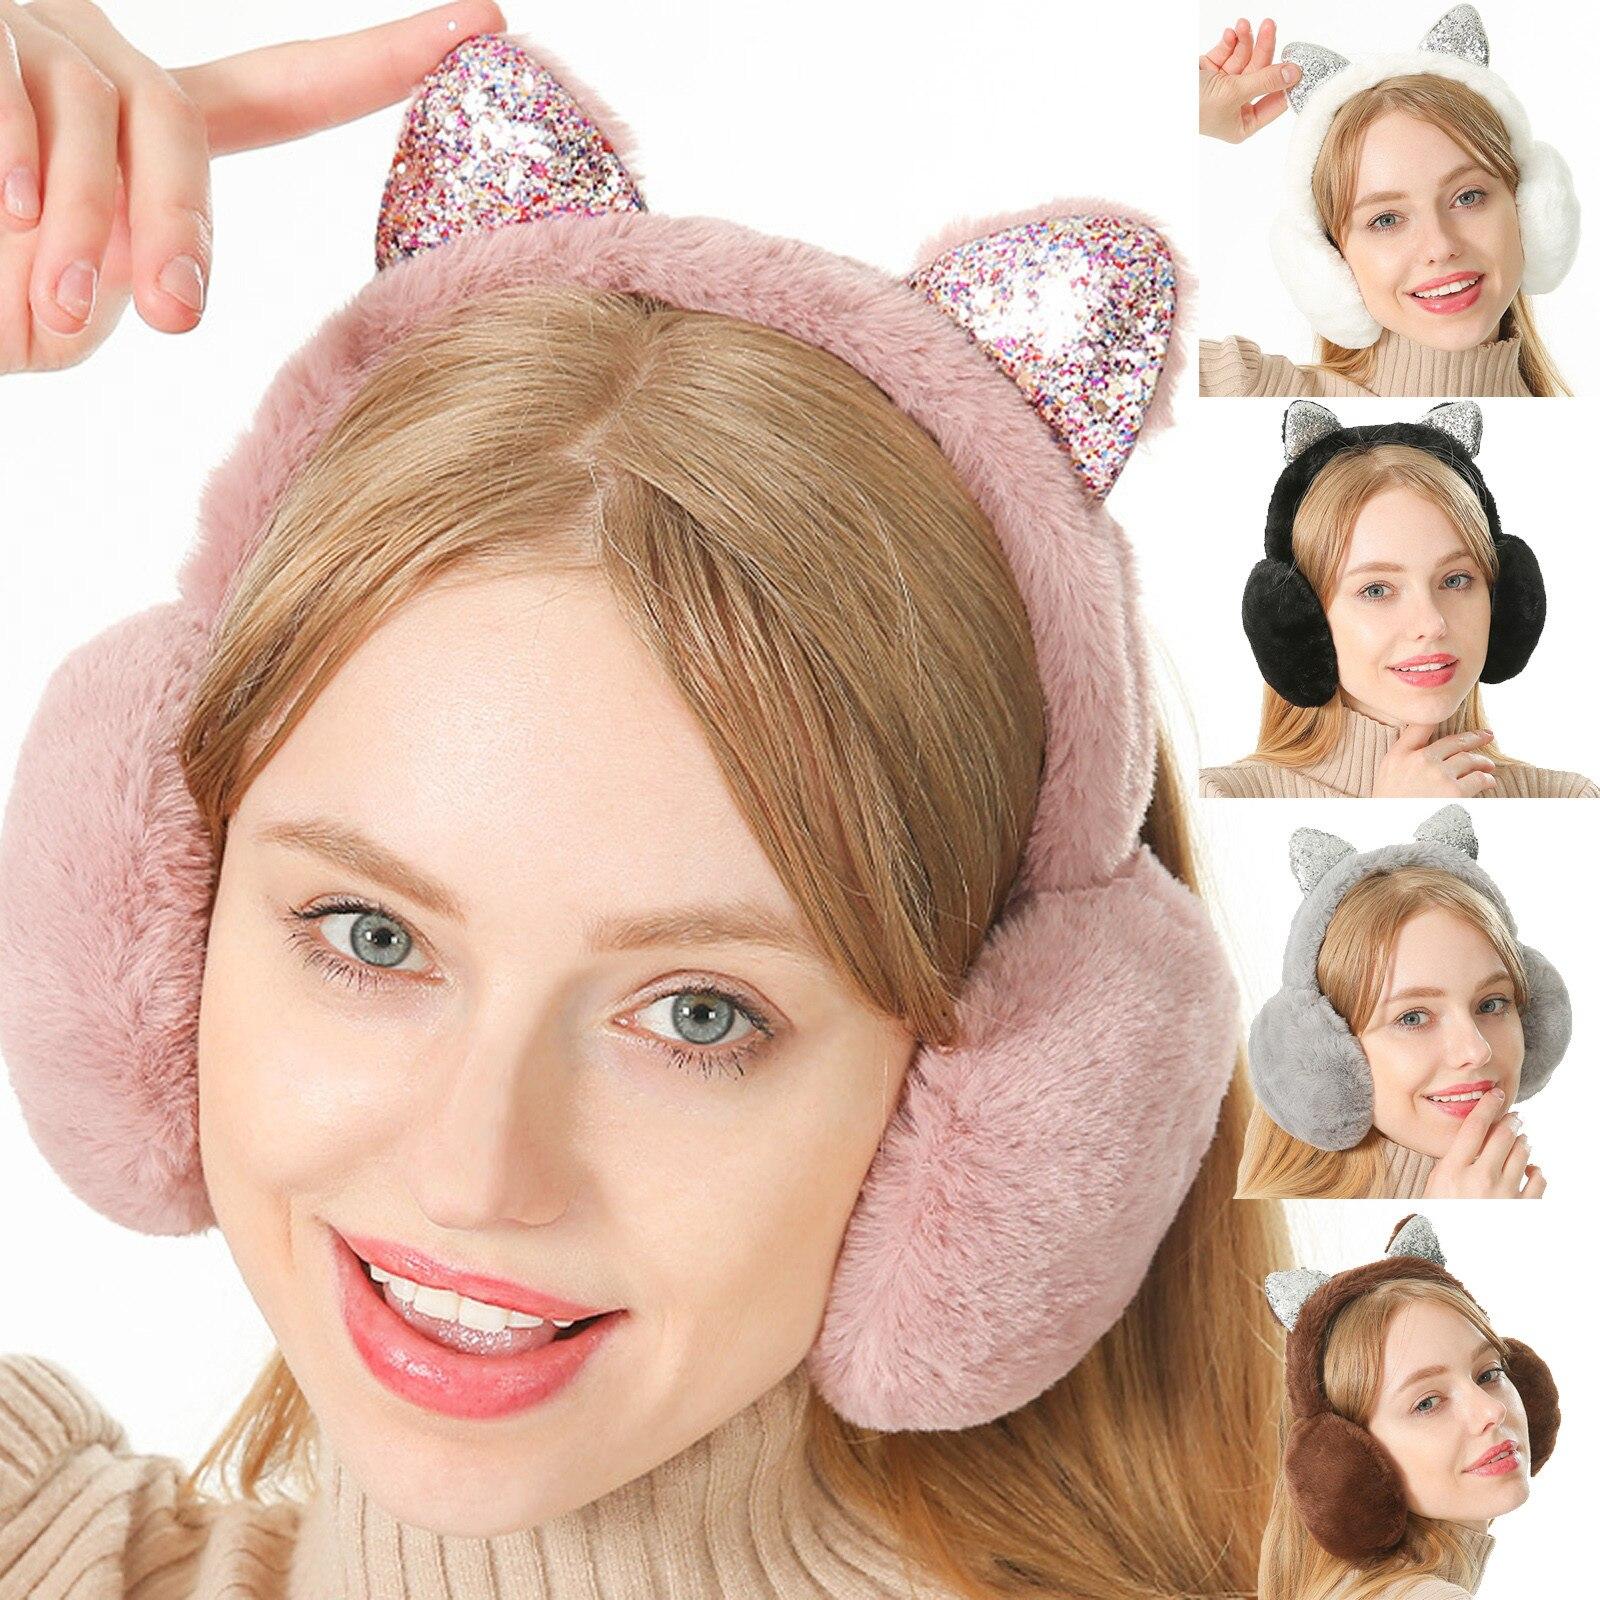 New Girls Cute Earmuffs Winter Sequinned Cartoon Plush Folding Ear Protectors Lady Windproof Warmers Earmuffs Orejeras Niña